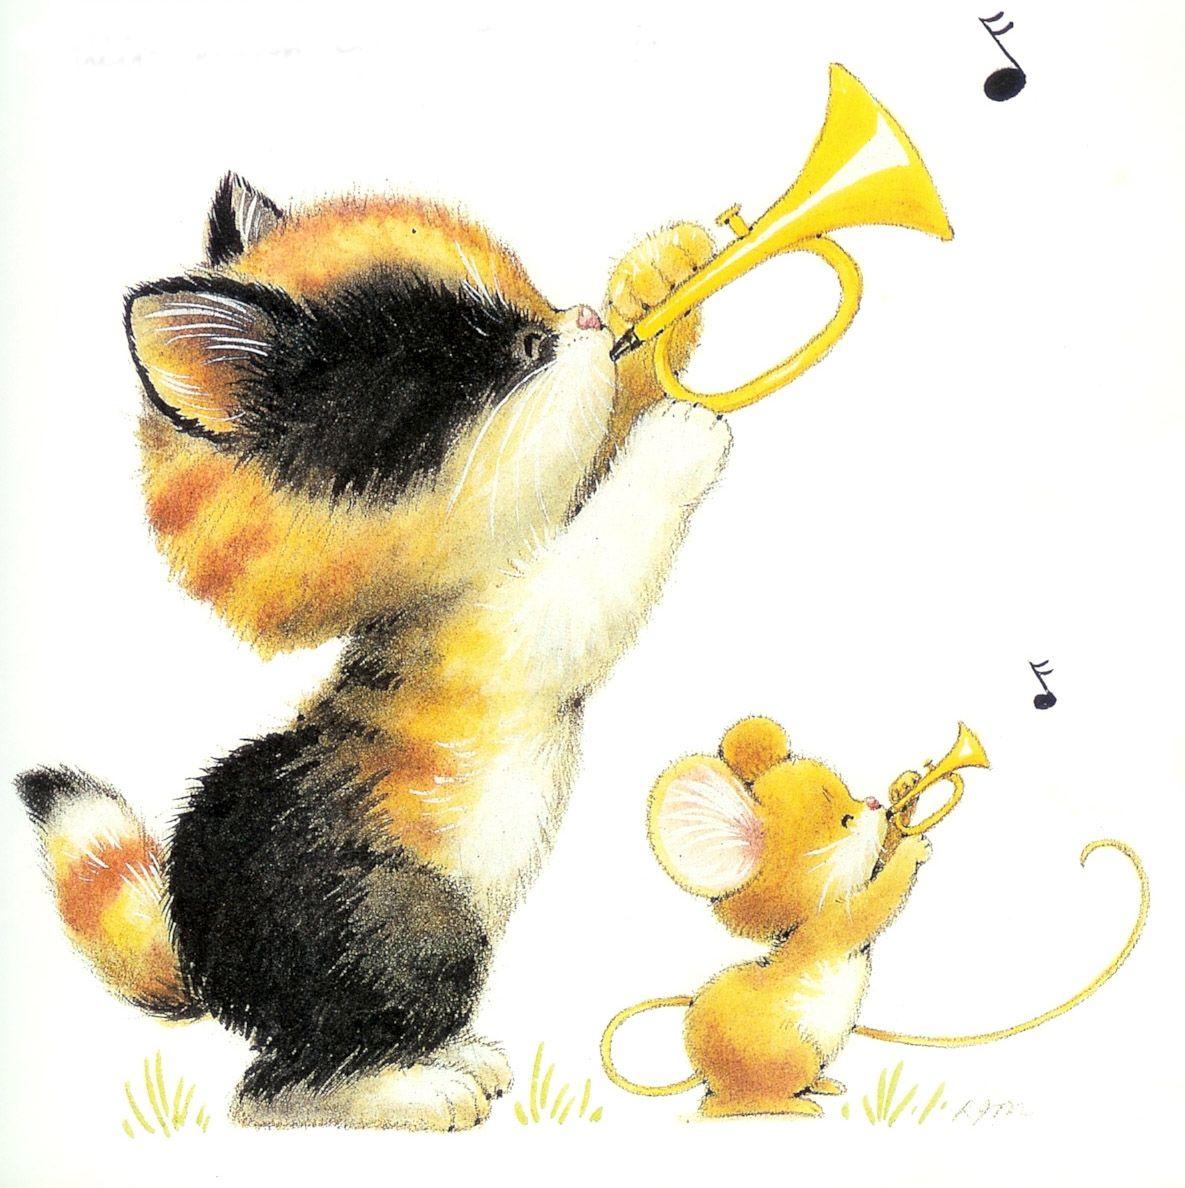 Gato Y Ratón Http Www Silvitablanco Com Ar Ruth Morehead Ruth Morehead Htm Cute Animal Illustration Cat Art Cute Pictures